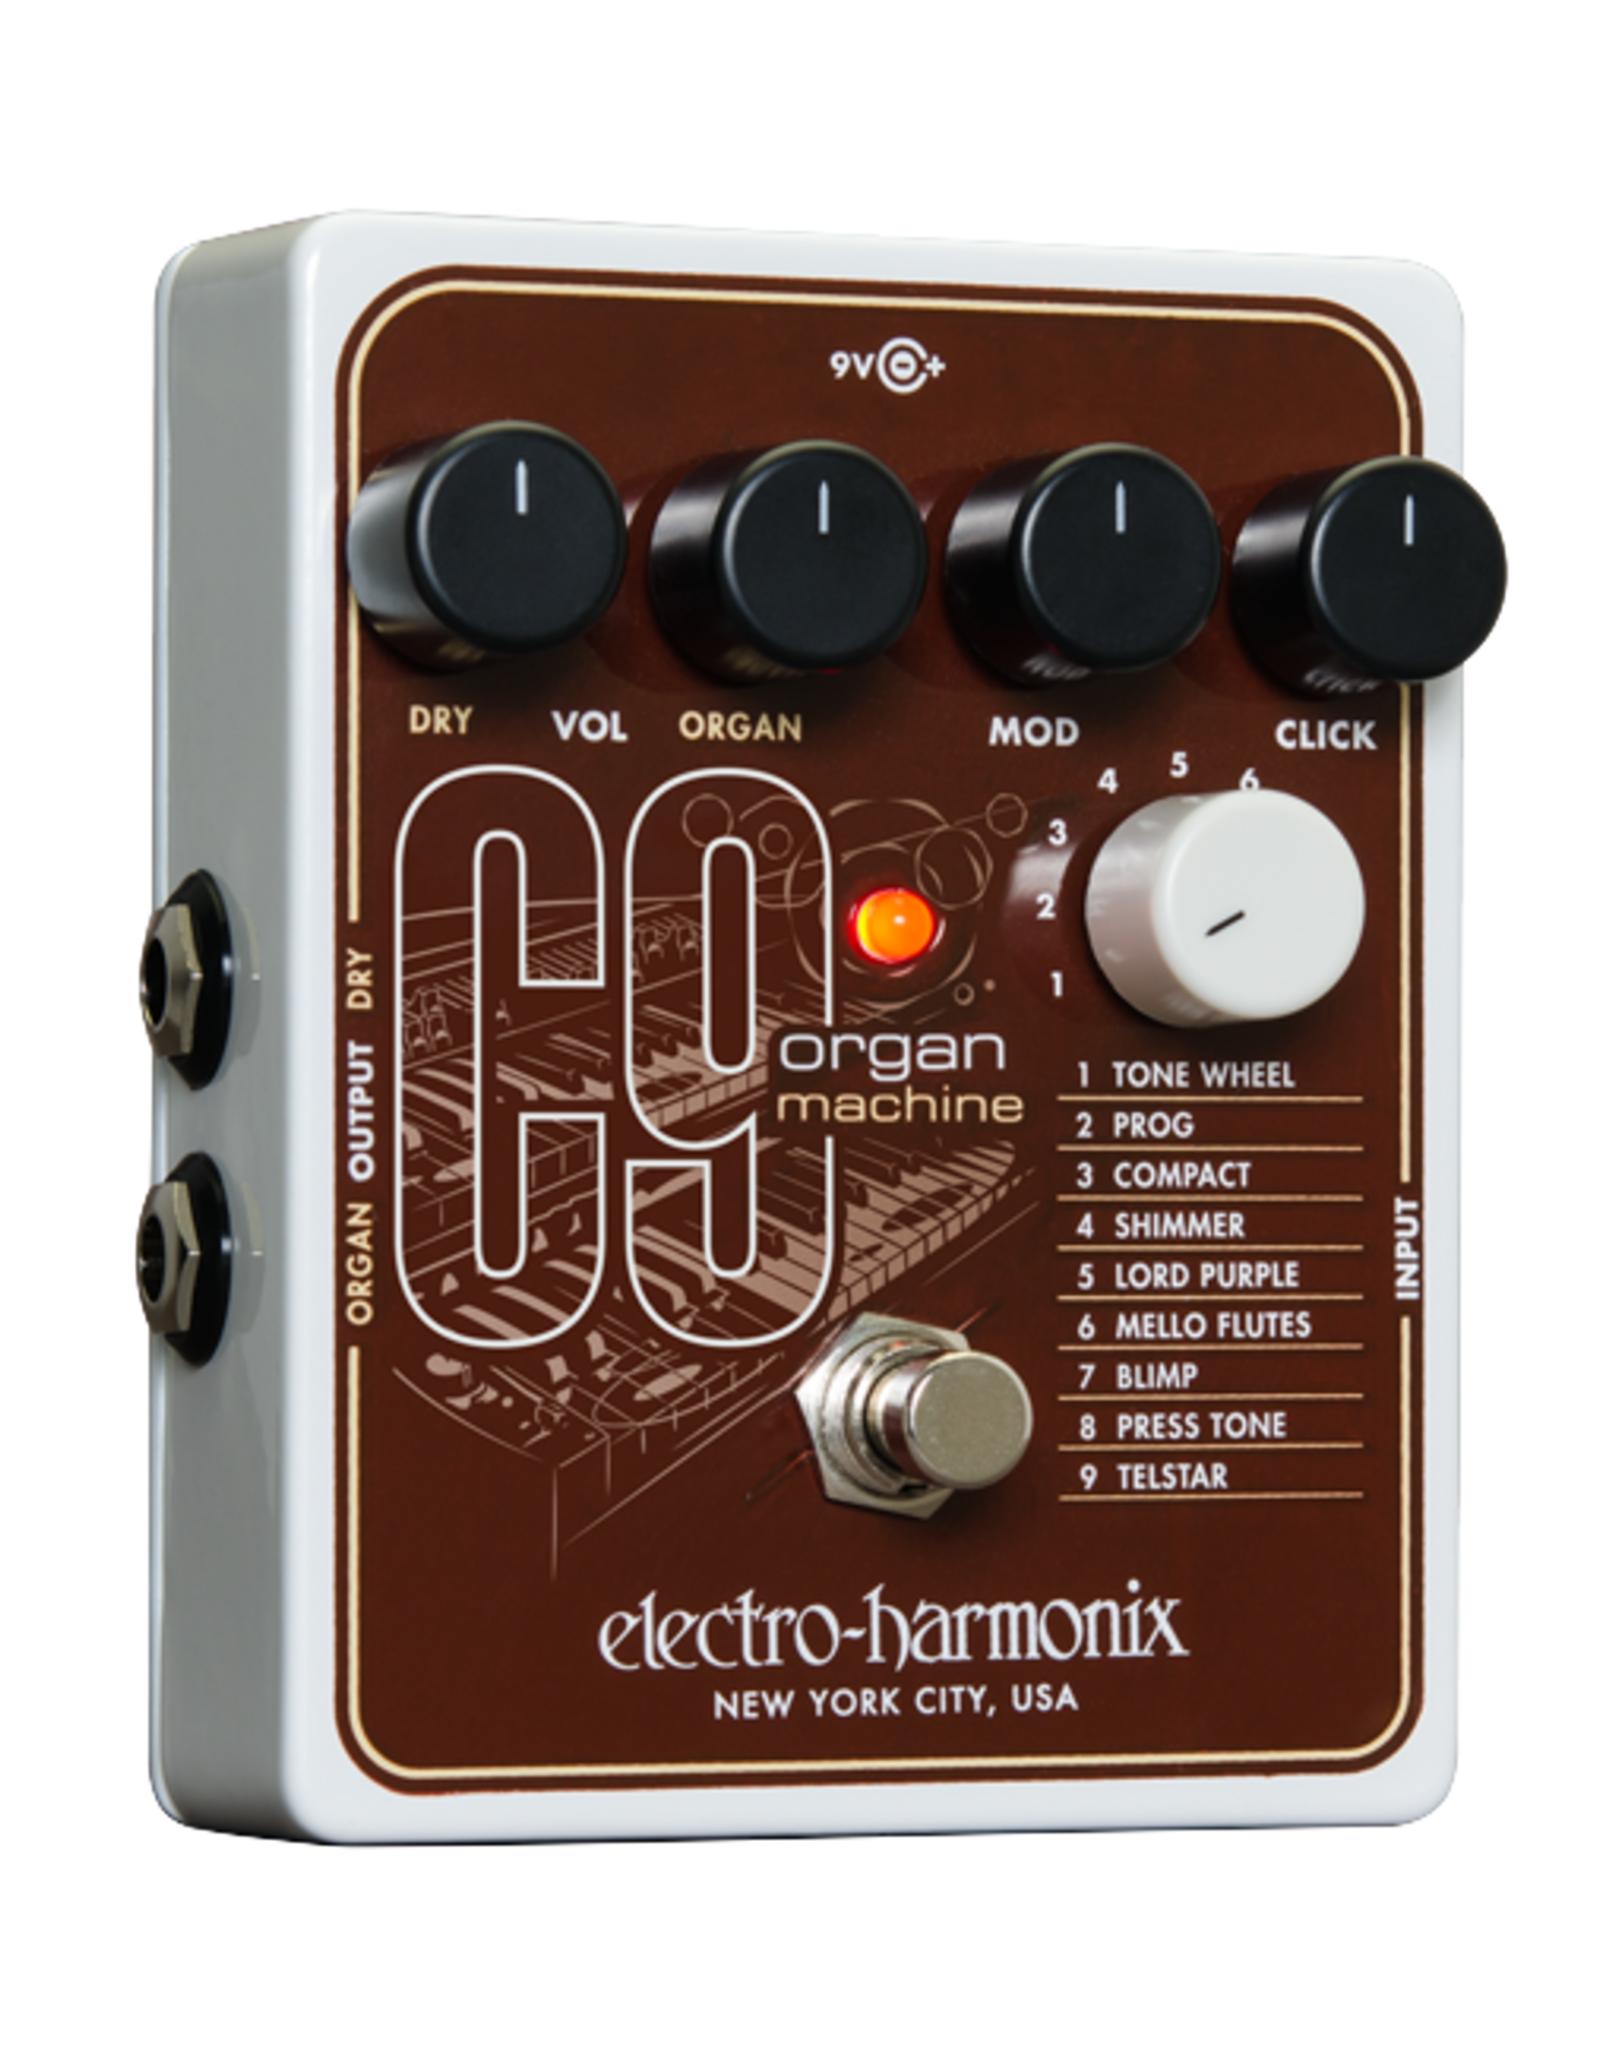 Electro-Harmonix EHX C9 Organ Machine, 9.6DC-200 PSU included